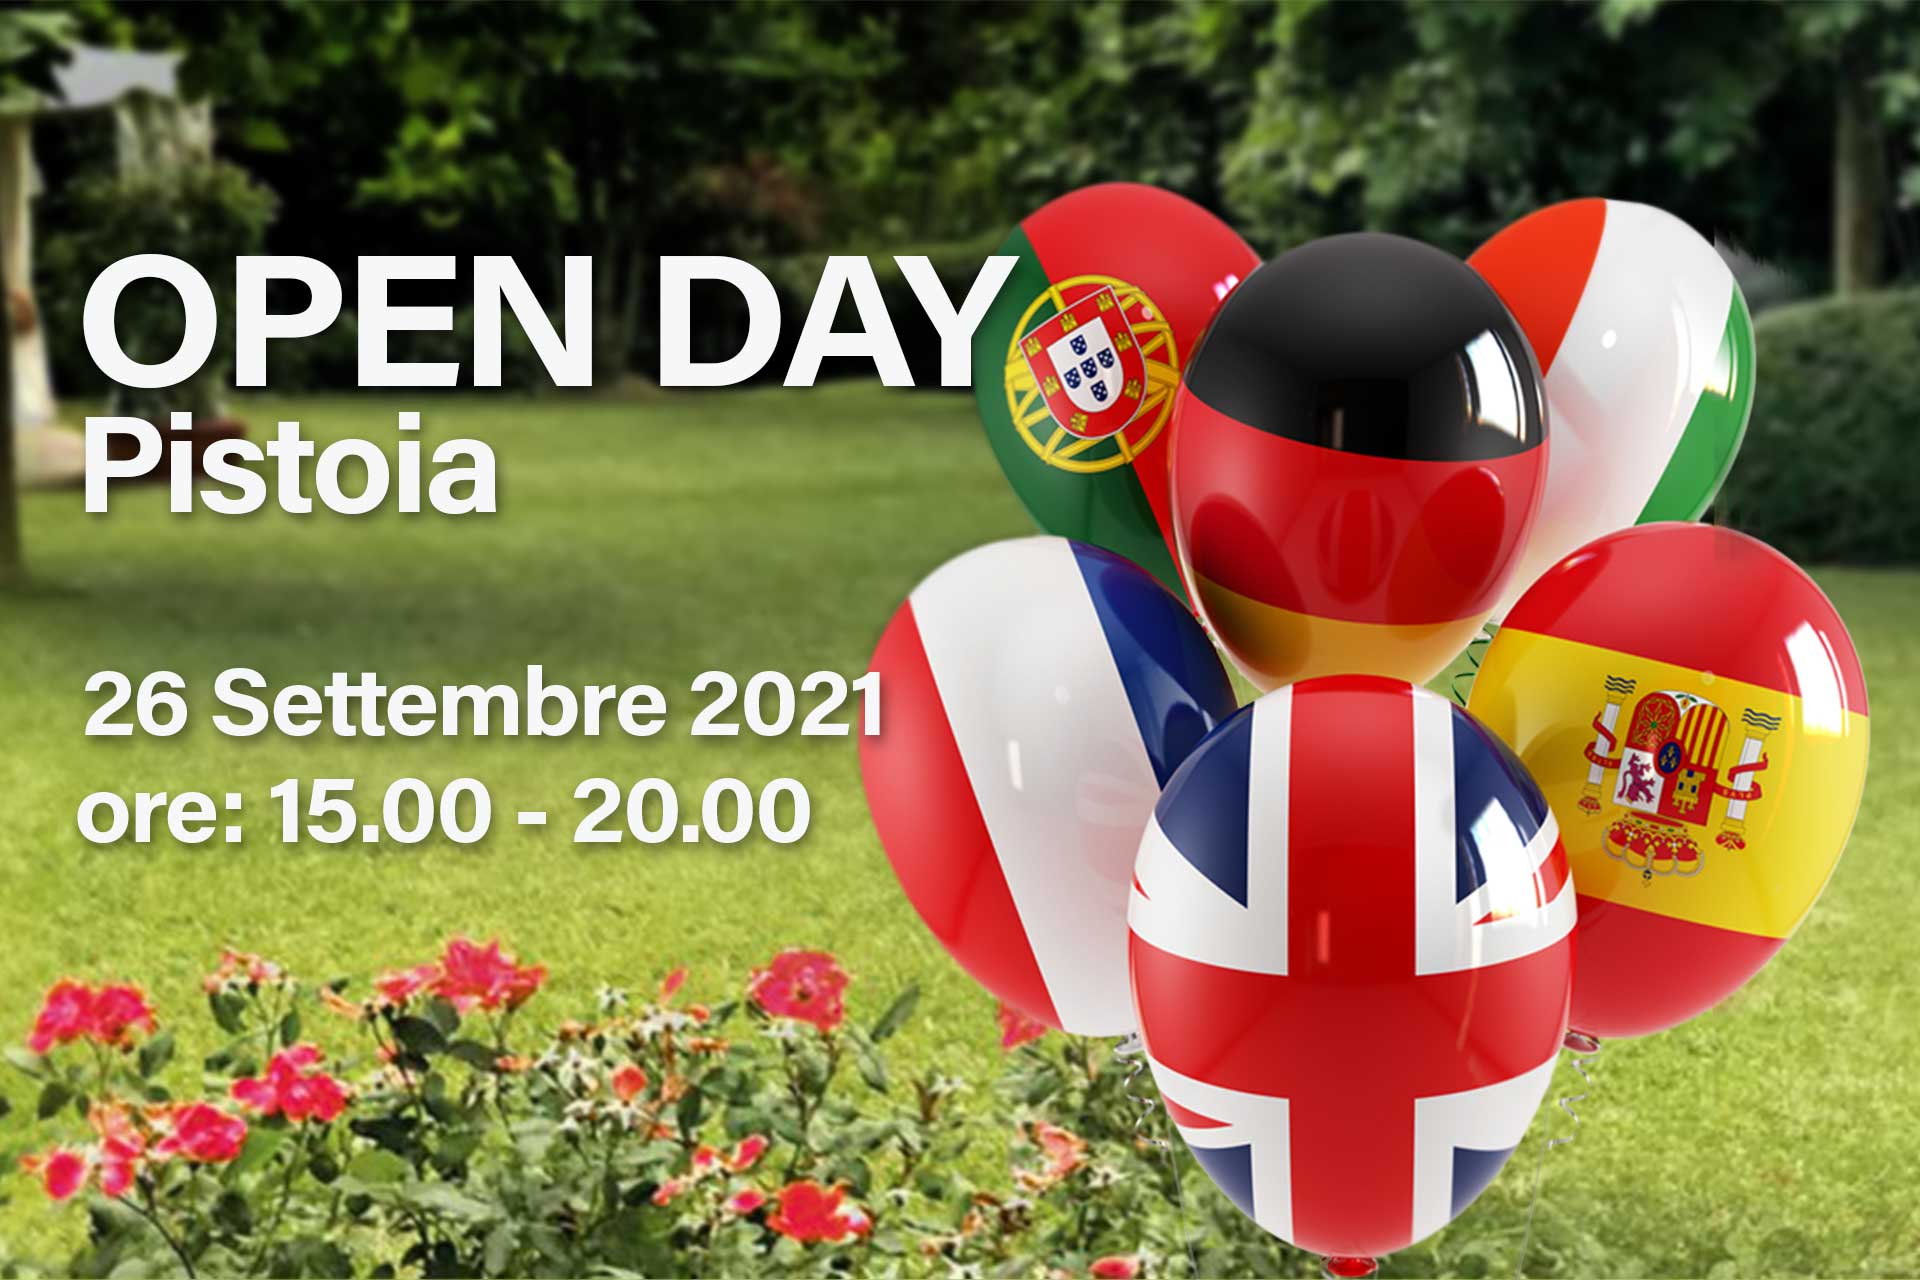 Hallo Open Day Pistoia